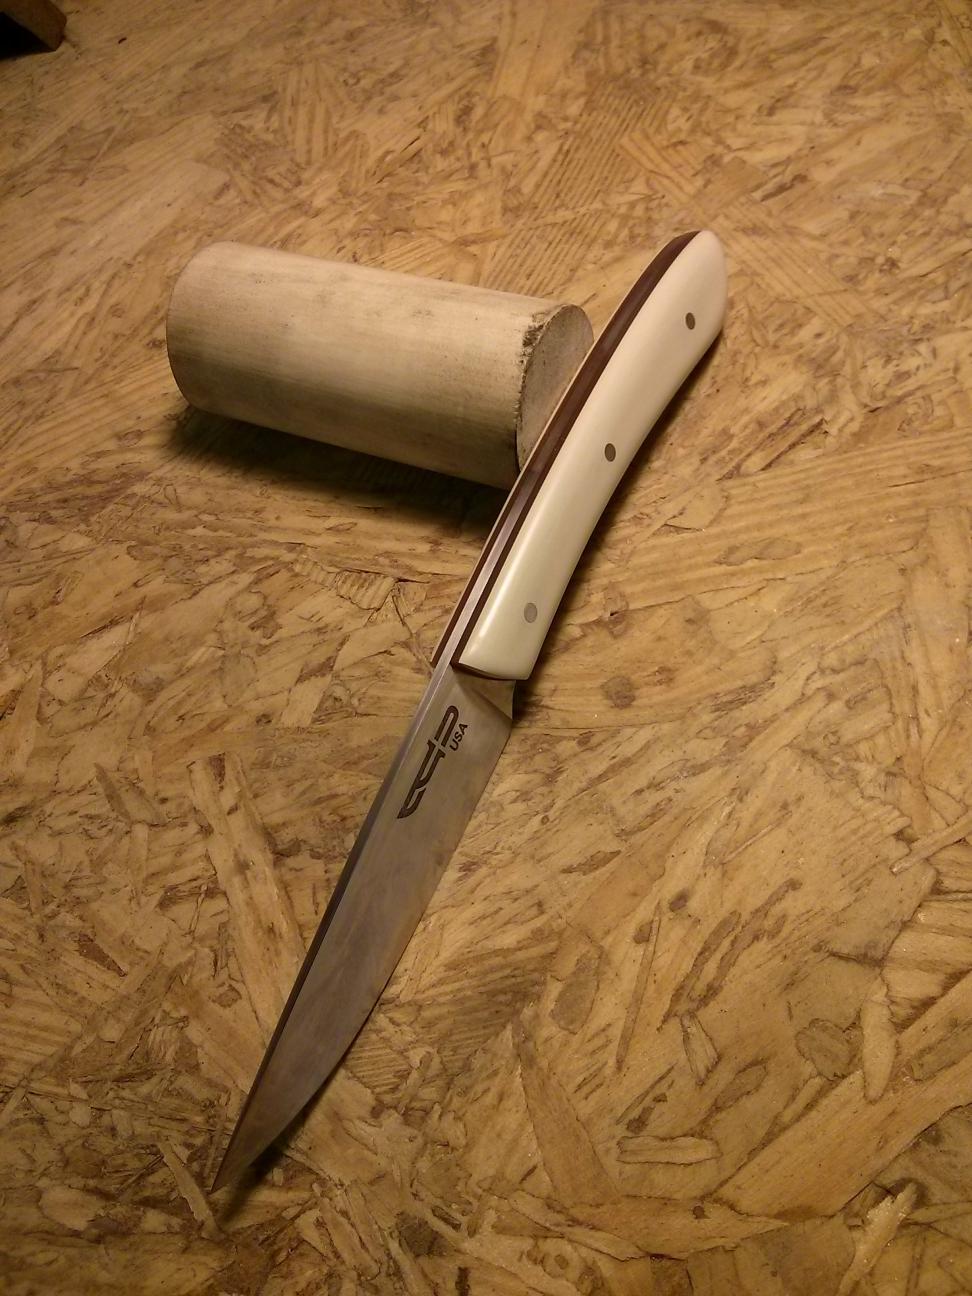 Scrapyard knives suck, chubbies red bank